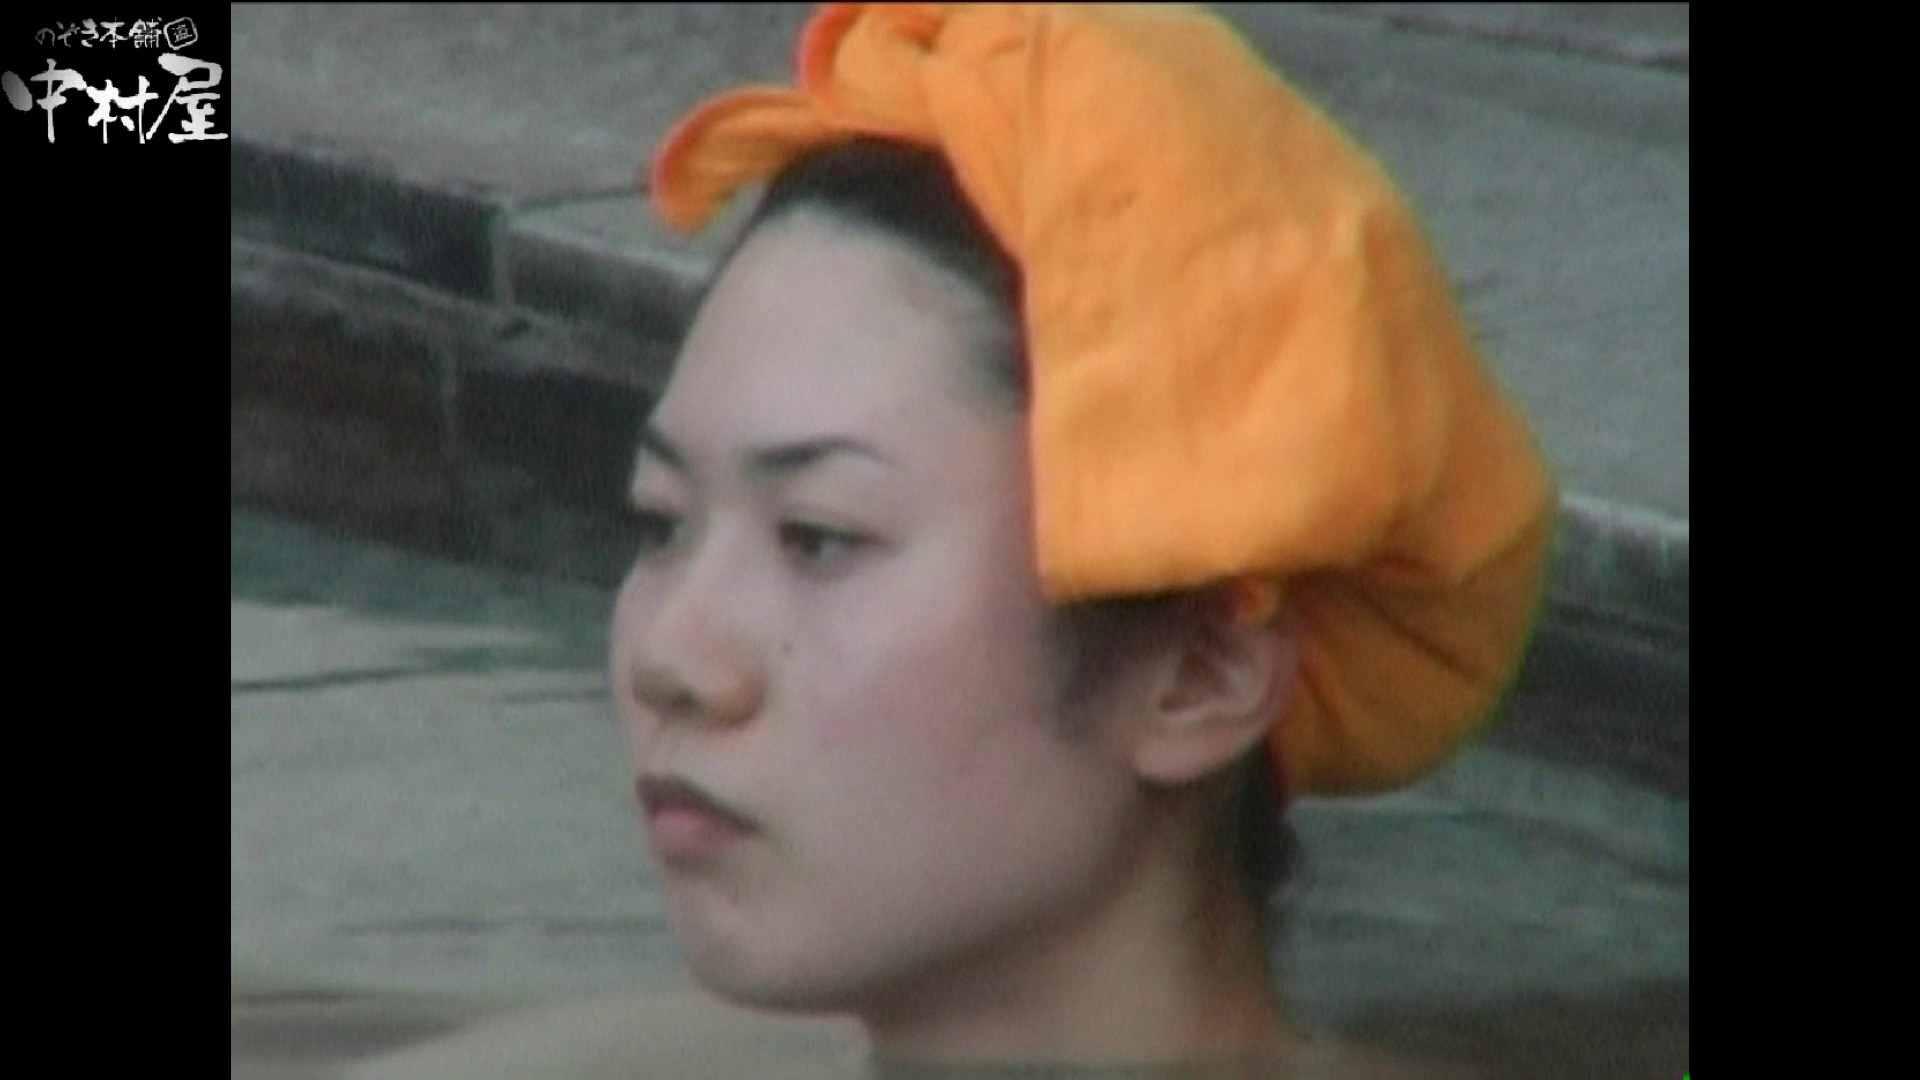 Aquaな露天風呂Vol.978 OLセックス | 露天  77画像 19